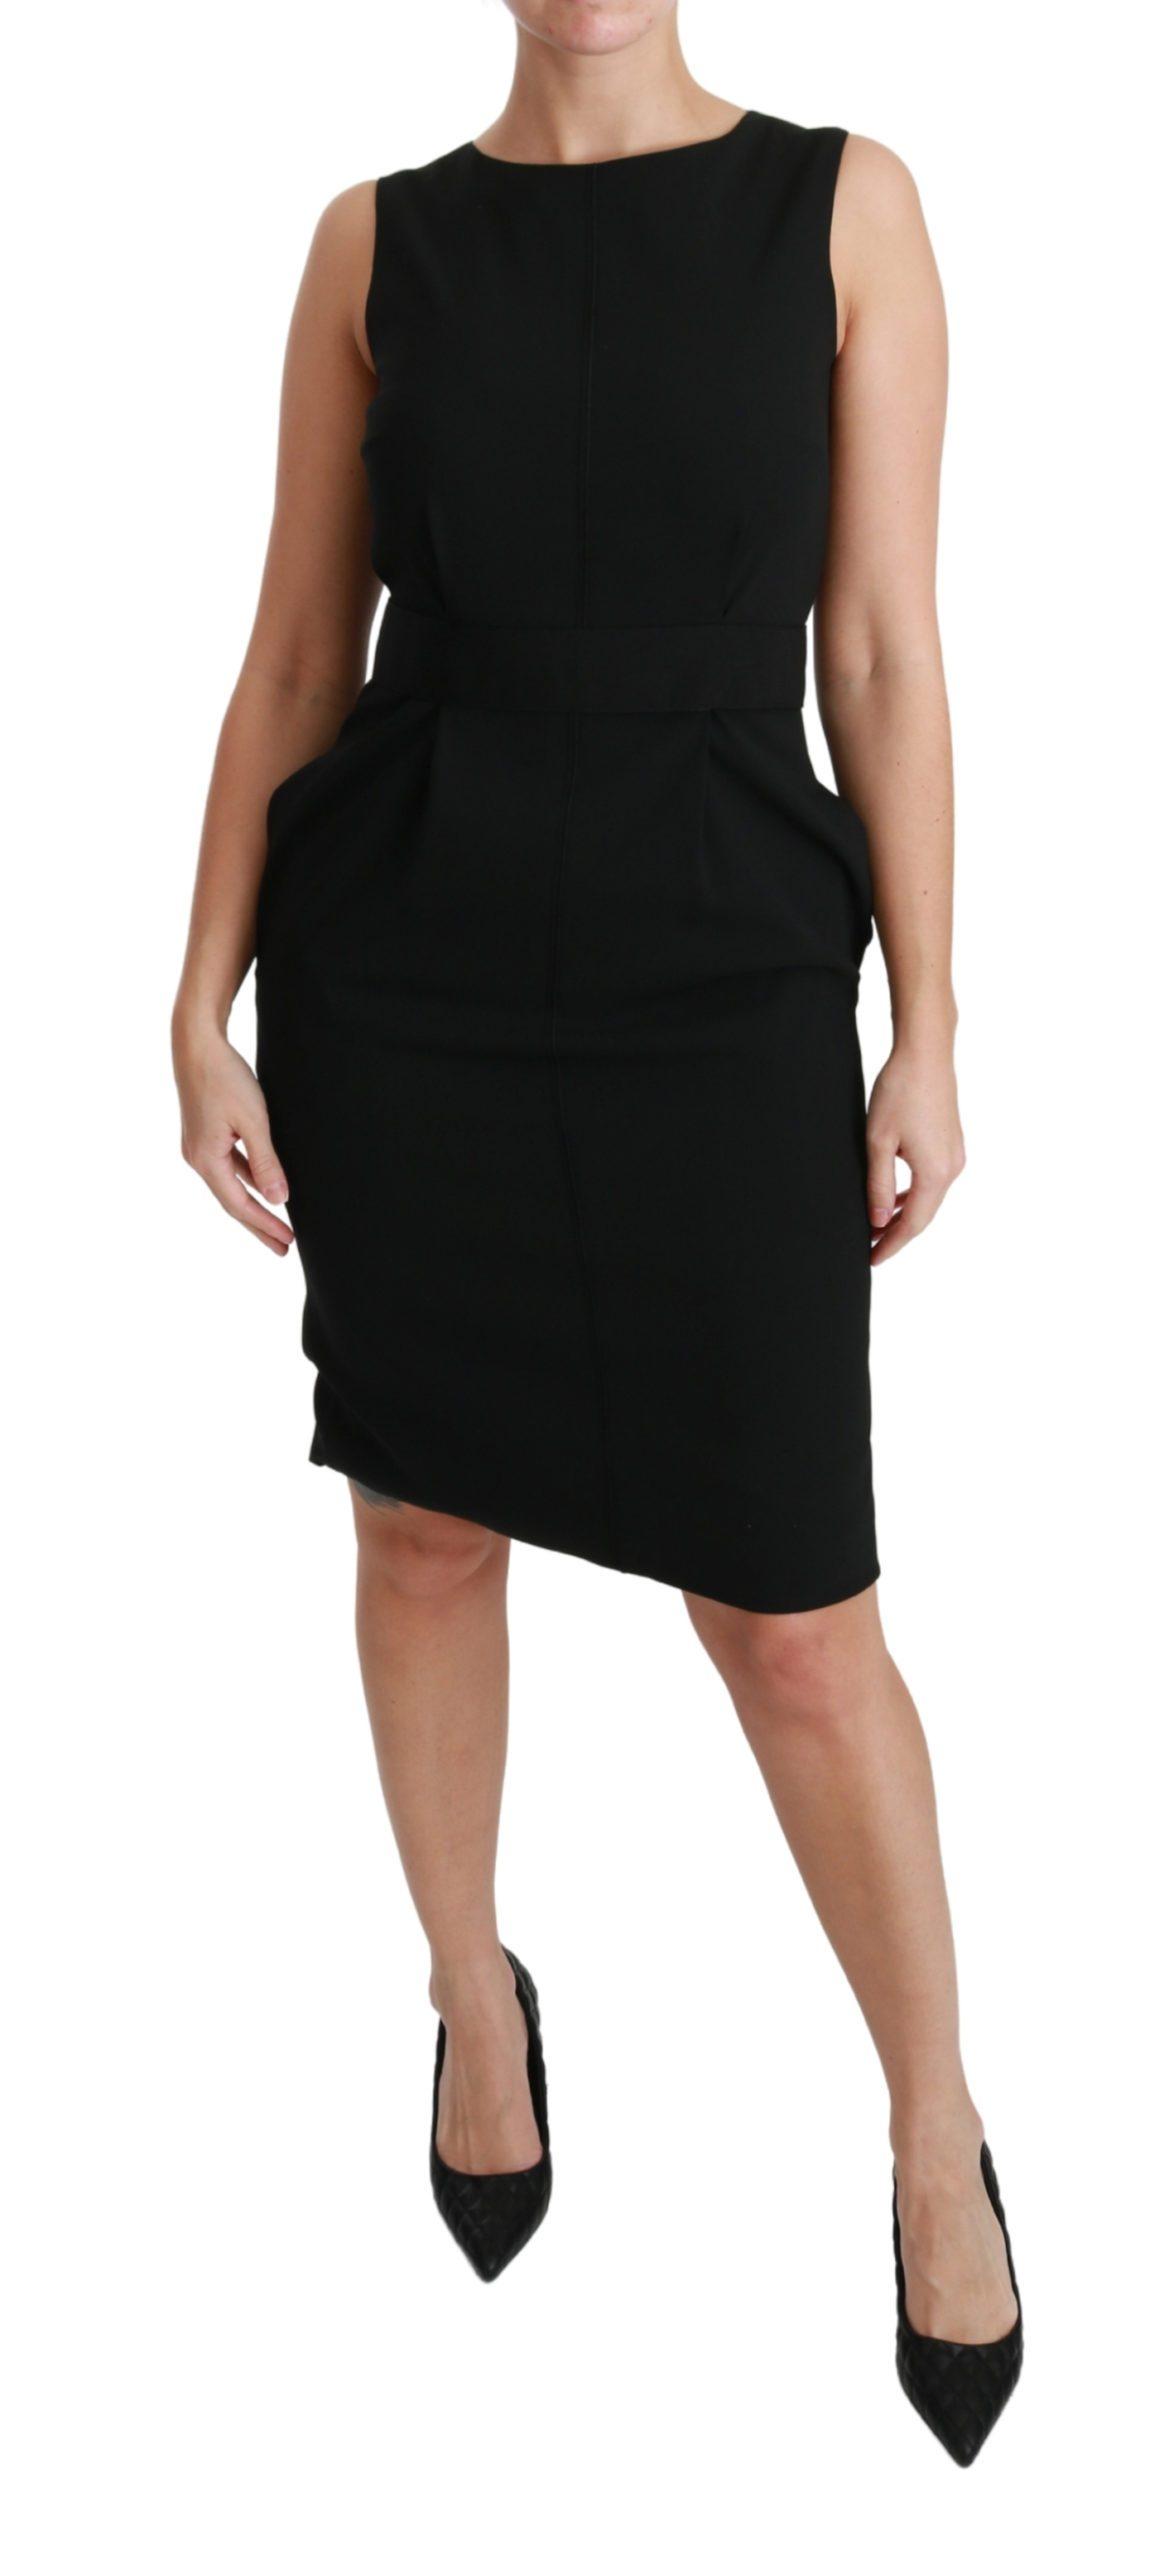 Dolce & Gabbana Women's Floral Sheath Stretch Formal Dress Black DR2165 - IT36   XS